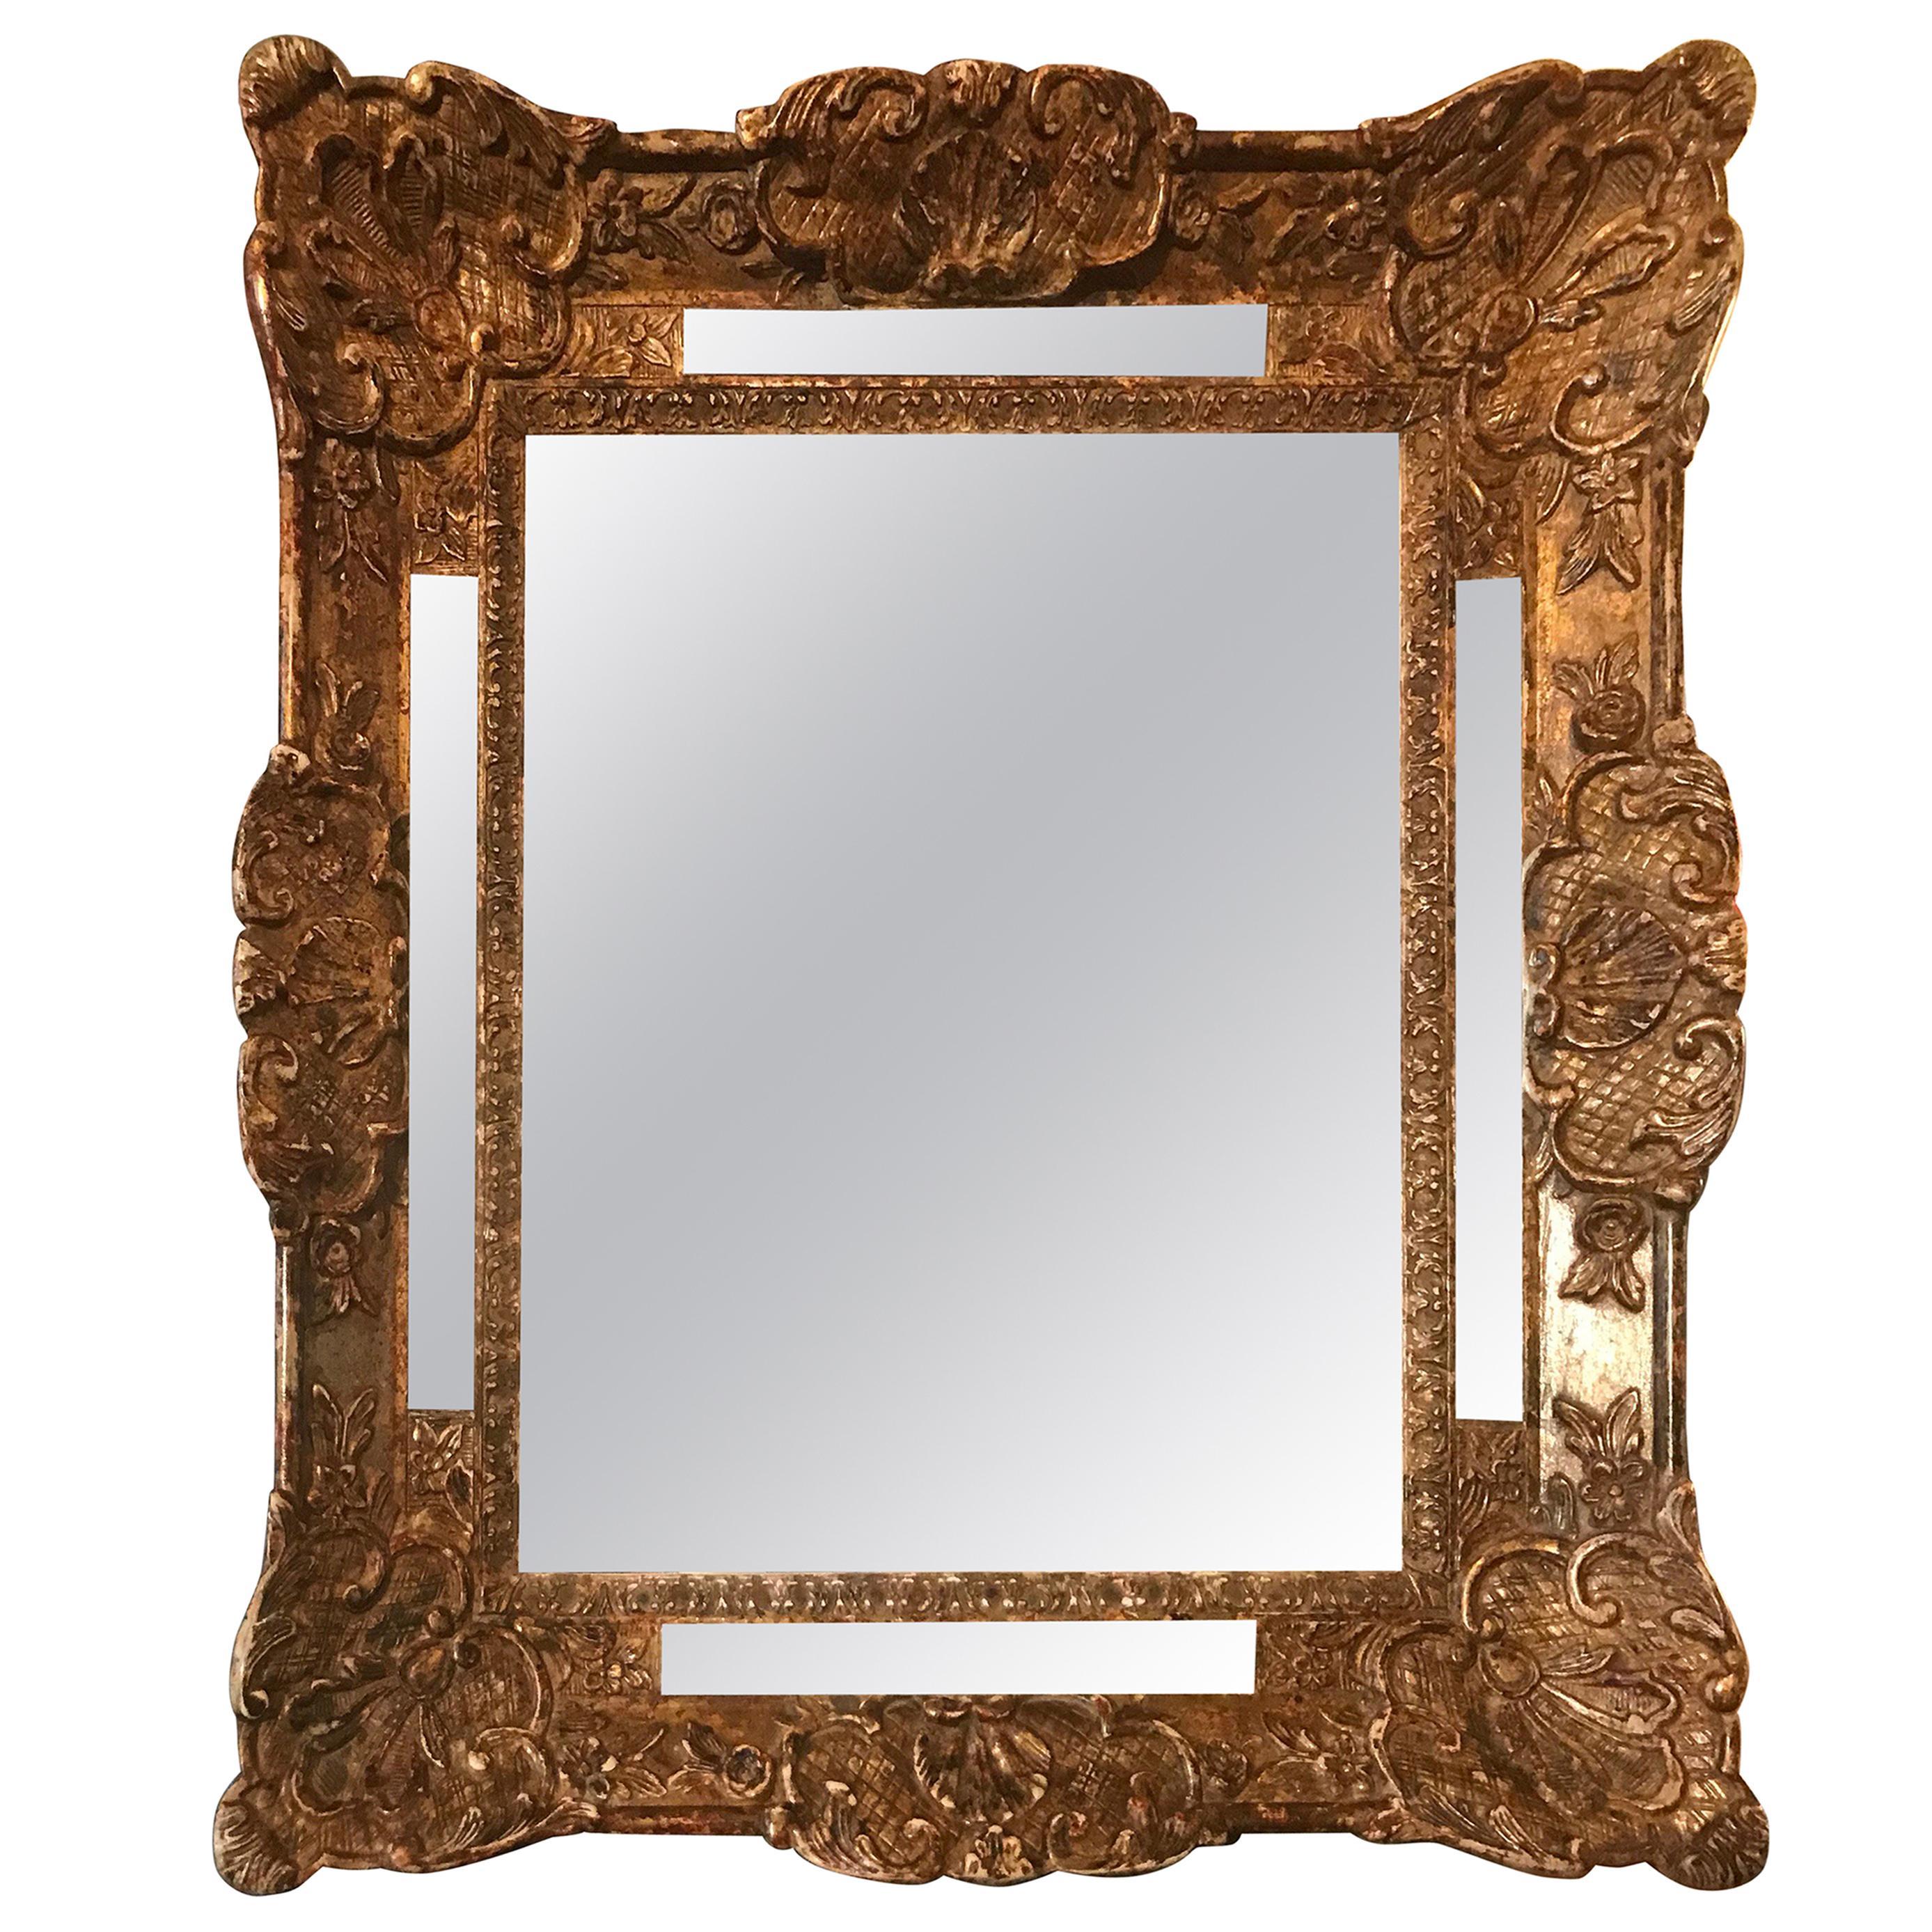 18th Century French Louis XIV Cushion Style Mirror